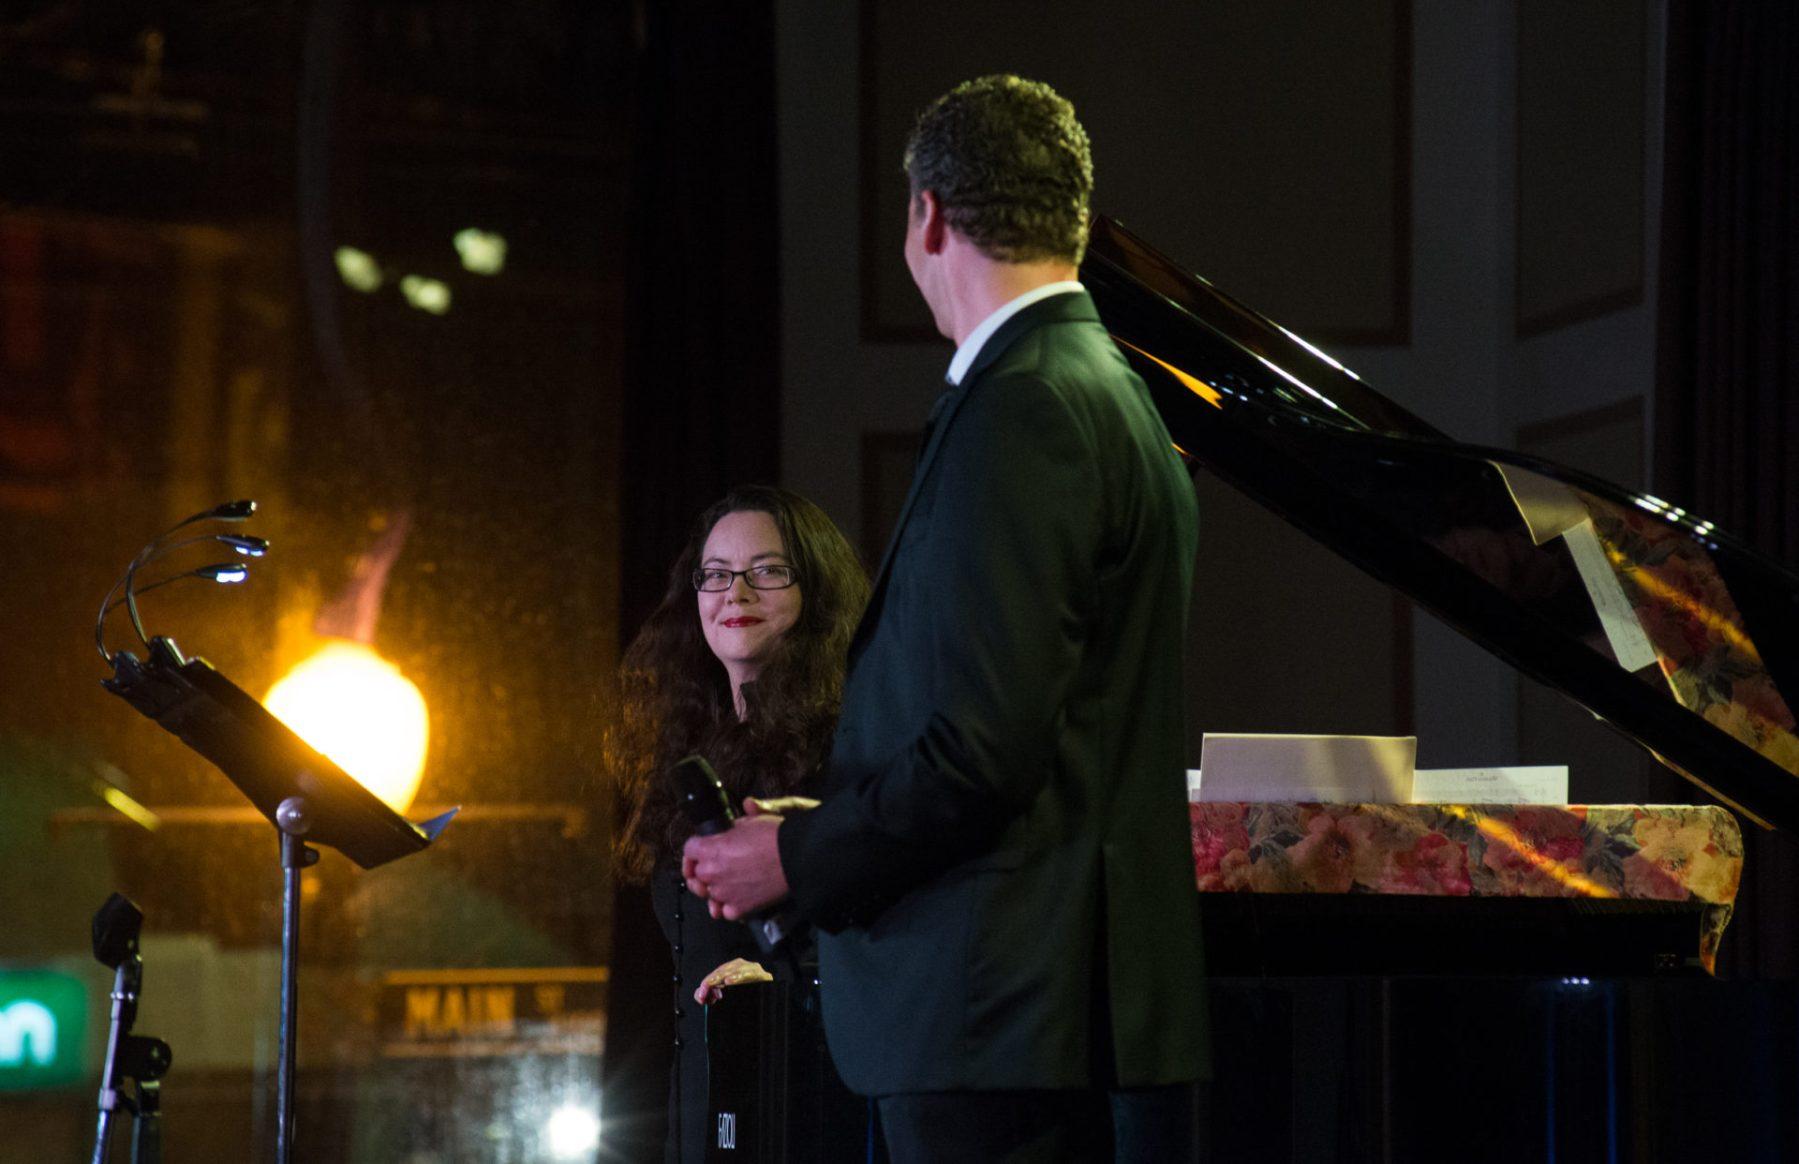 Rachel Kiyo Iwaasa & Steve Maddock, Music for the Winter Solstice 2015